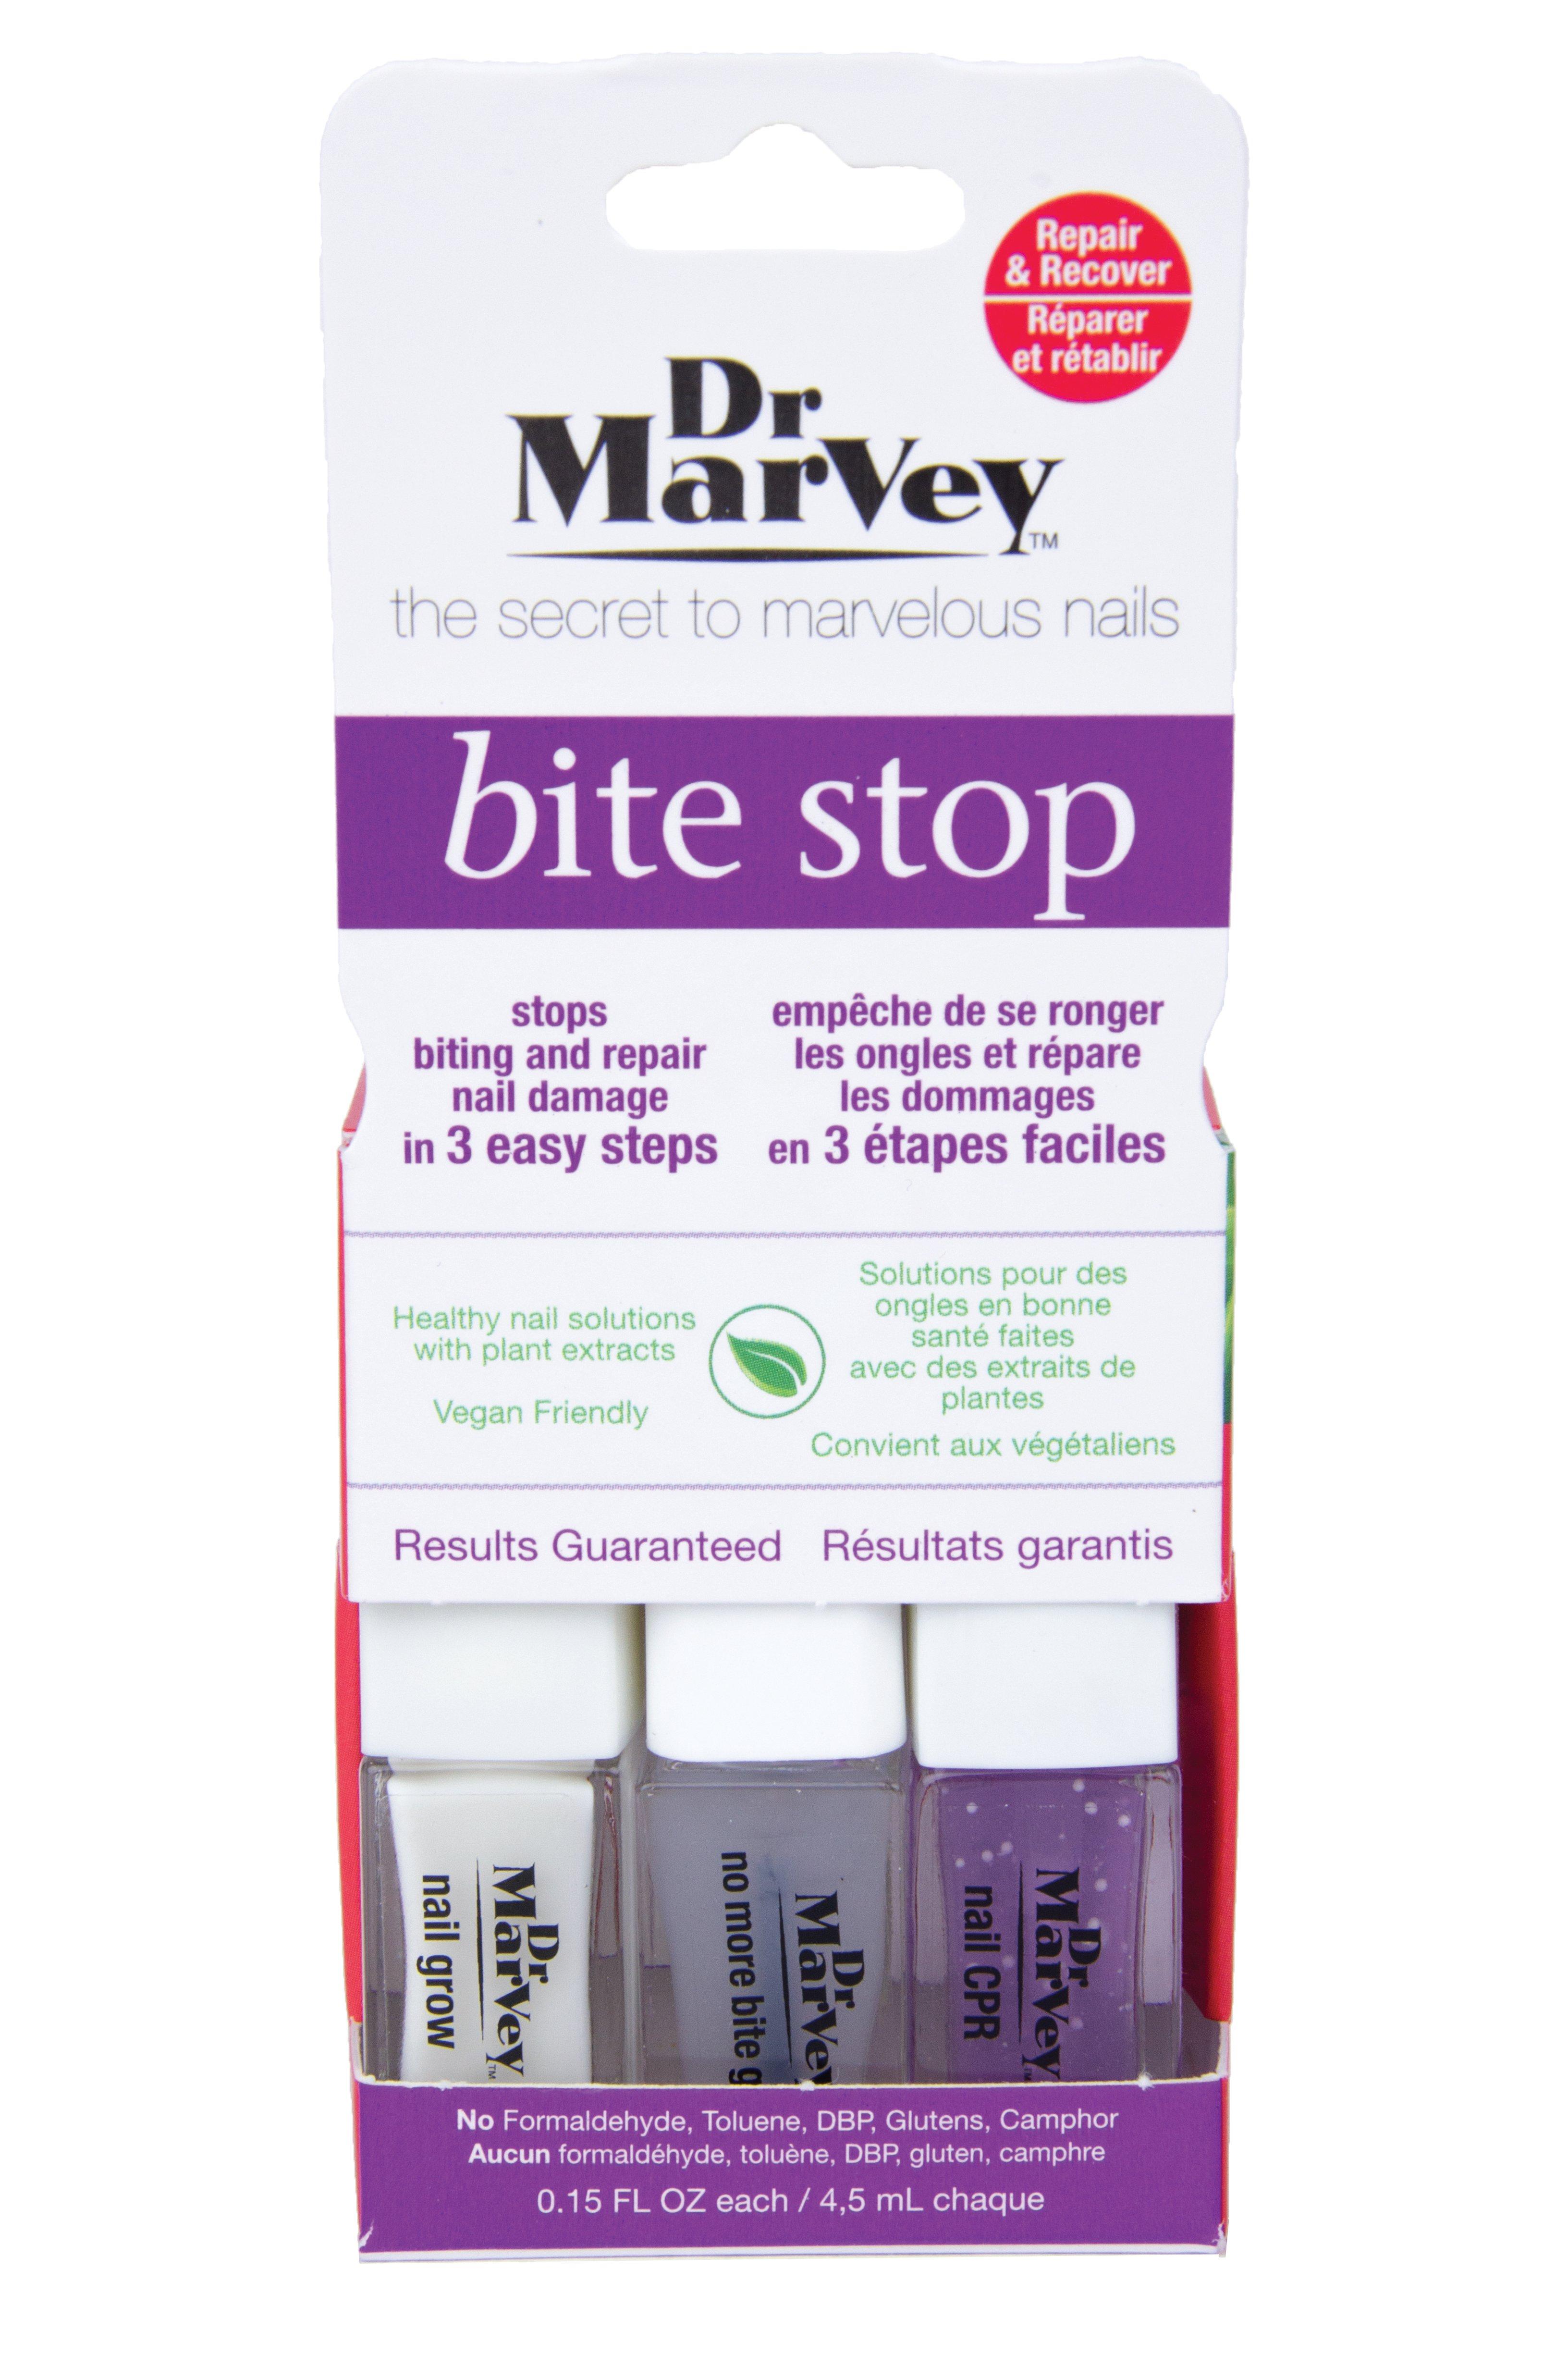 Dr Marvey Bite Stop for Nails - Shop Nail Treatments at HEB